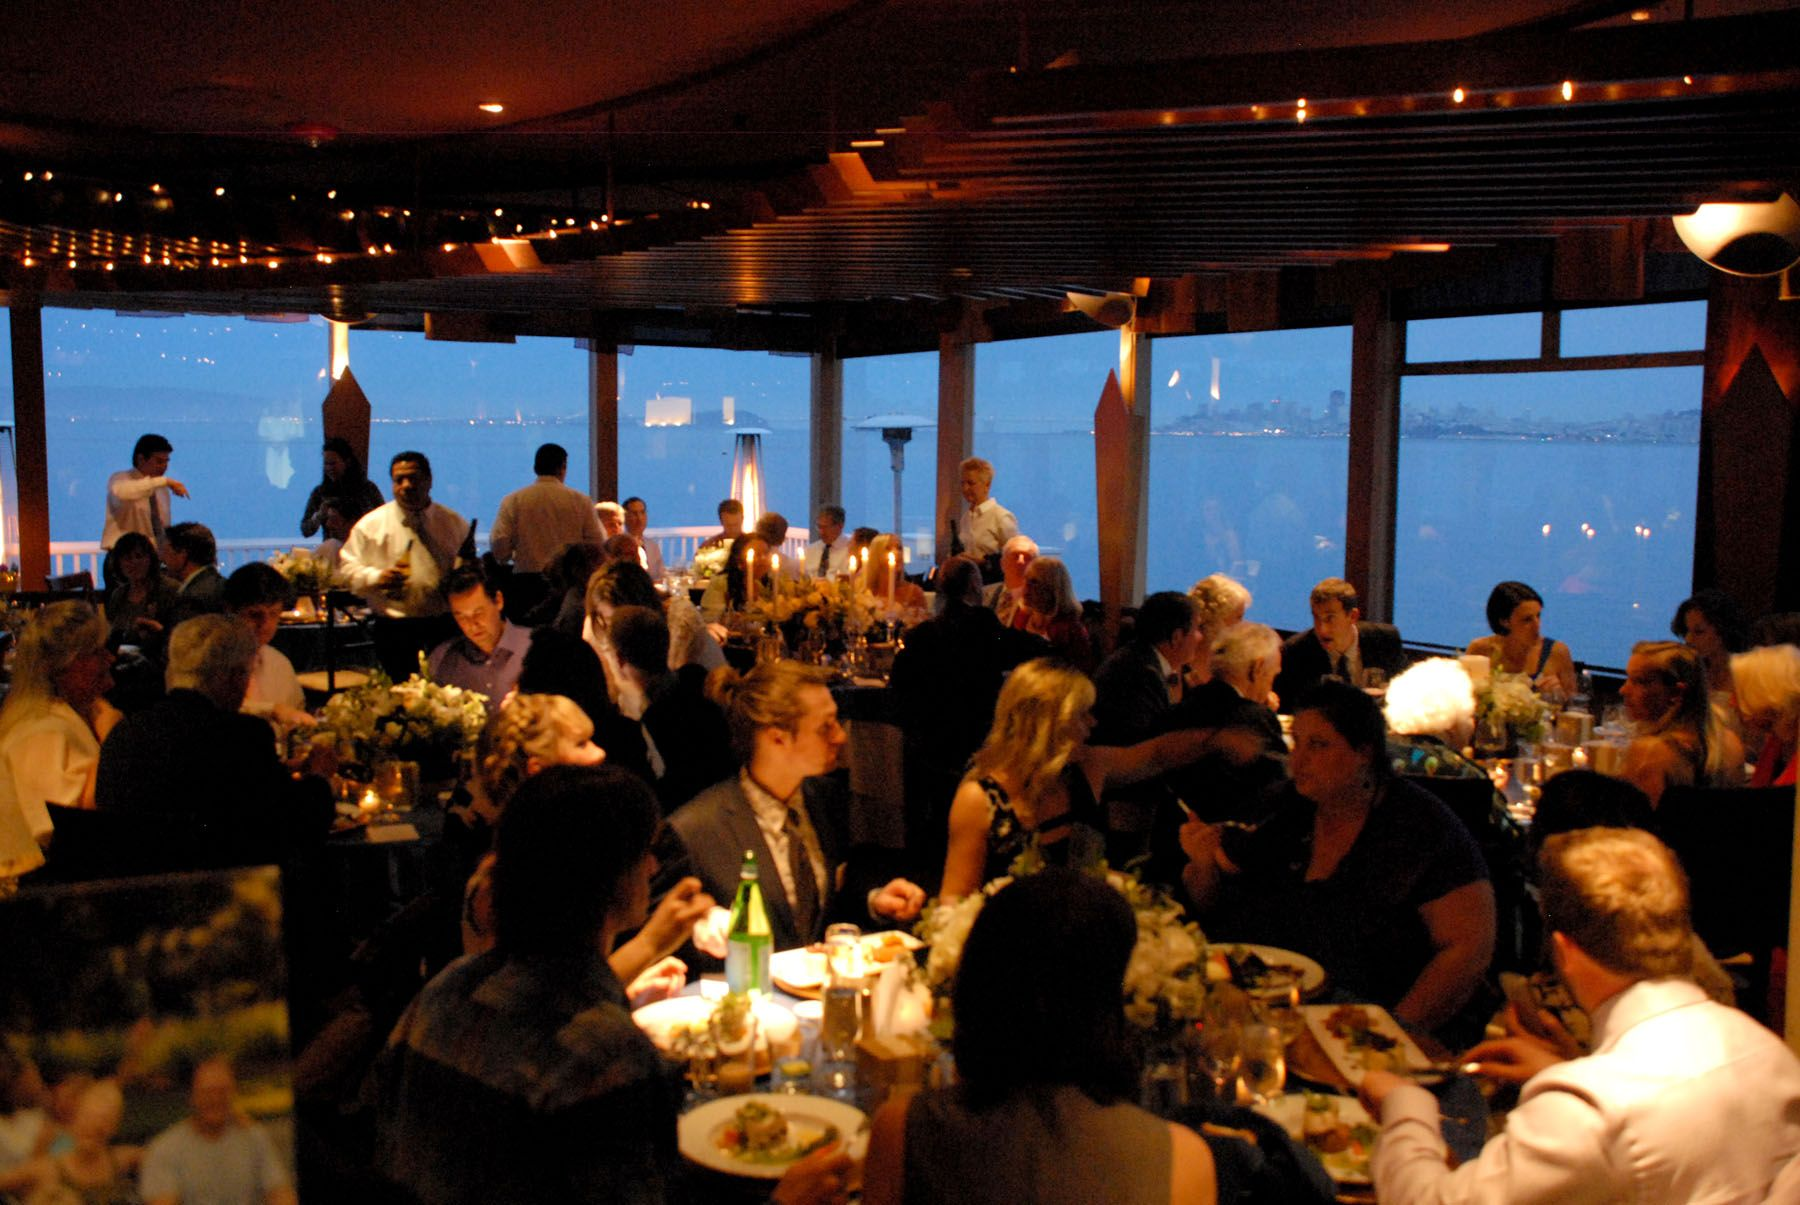 Ondine Sausalito San Francisco Bay Area Restaurant Wedding And Special Event Location